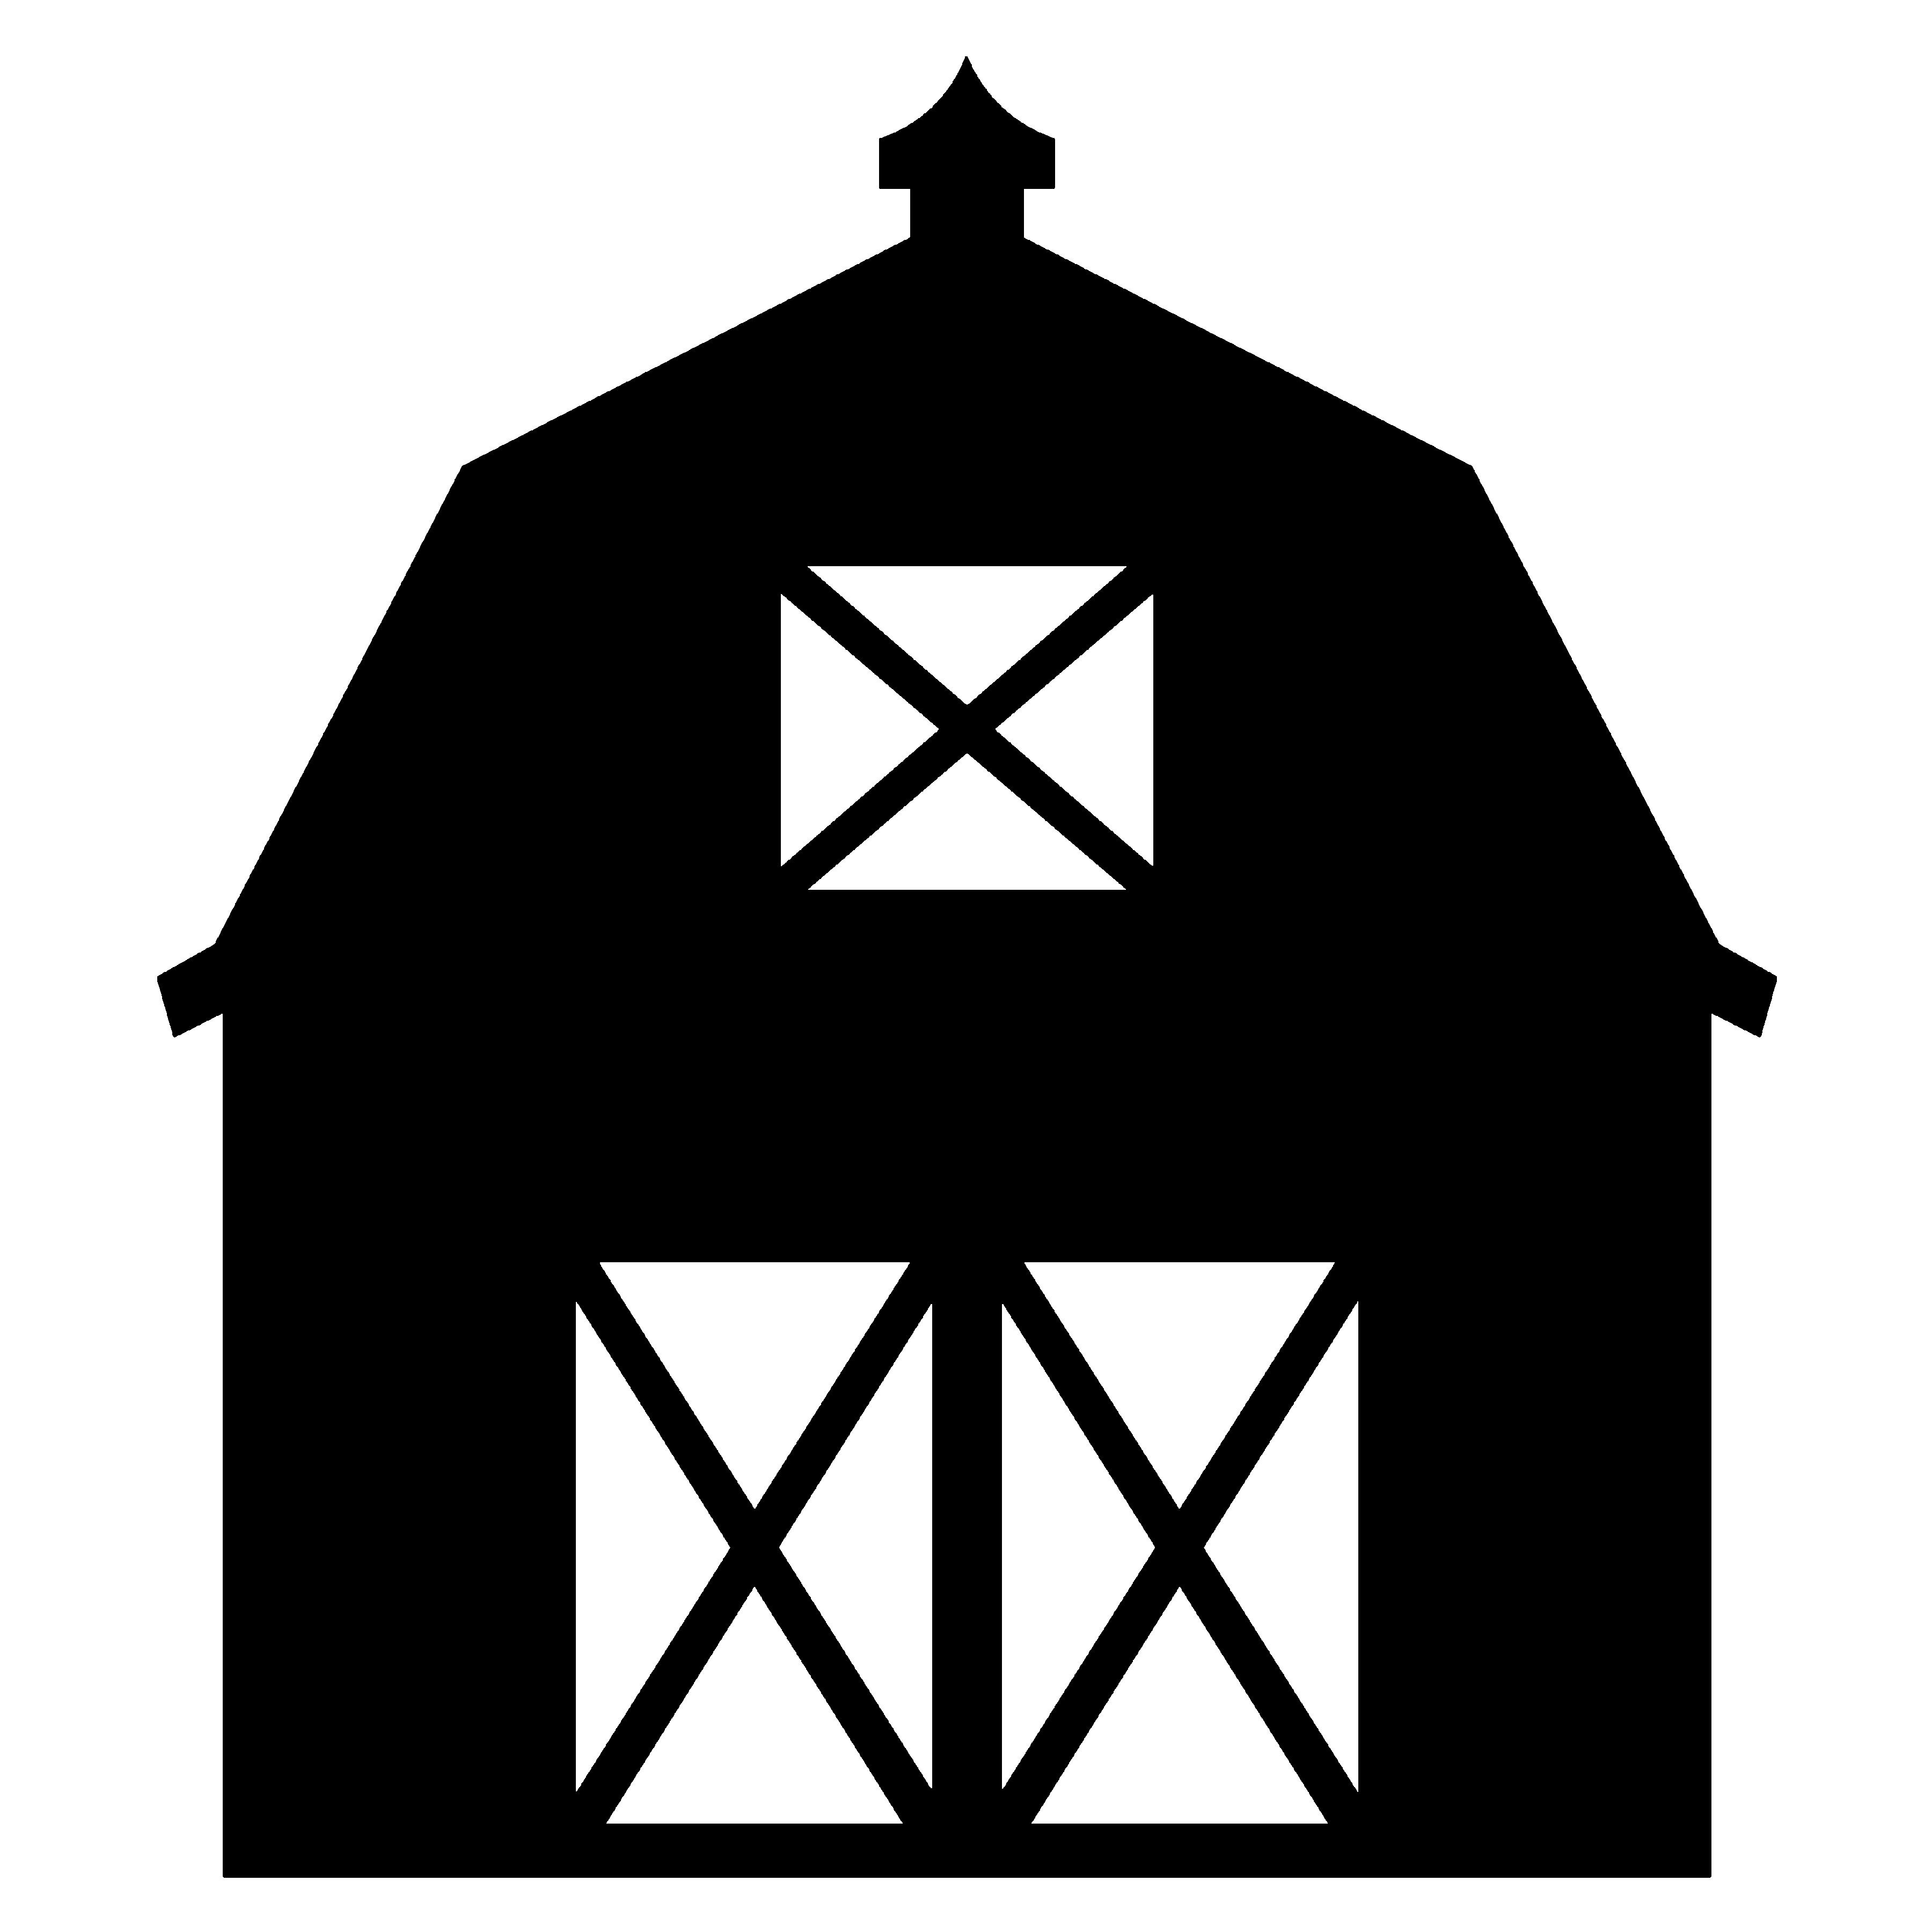 3600x3600 Barn Clipart Outline